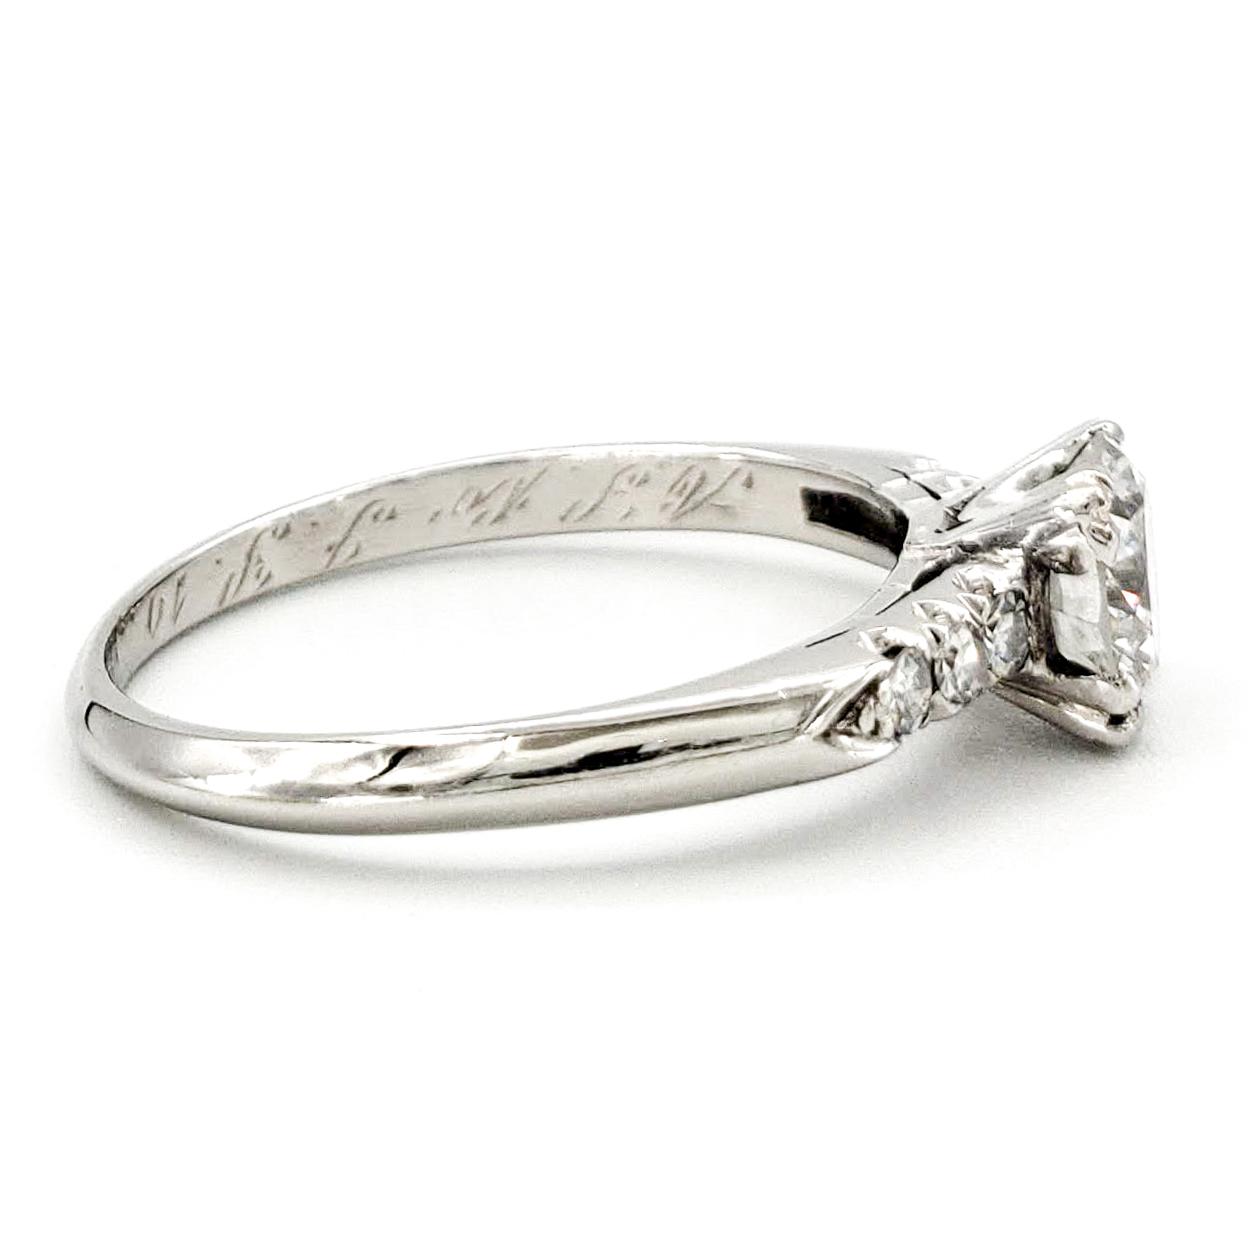 vintage-platinum-engagement-ring-with-0-62-carat-round-brilliant-cut-diamond-egl-e-vs1